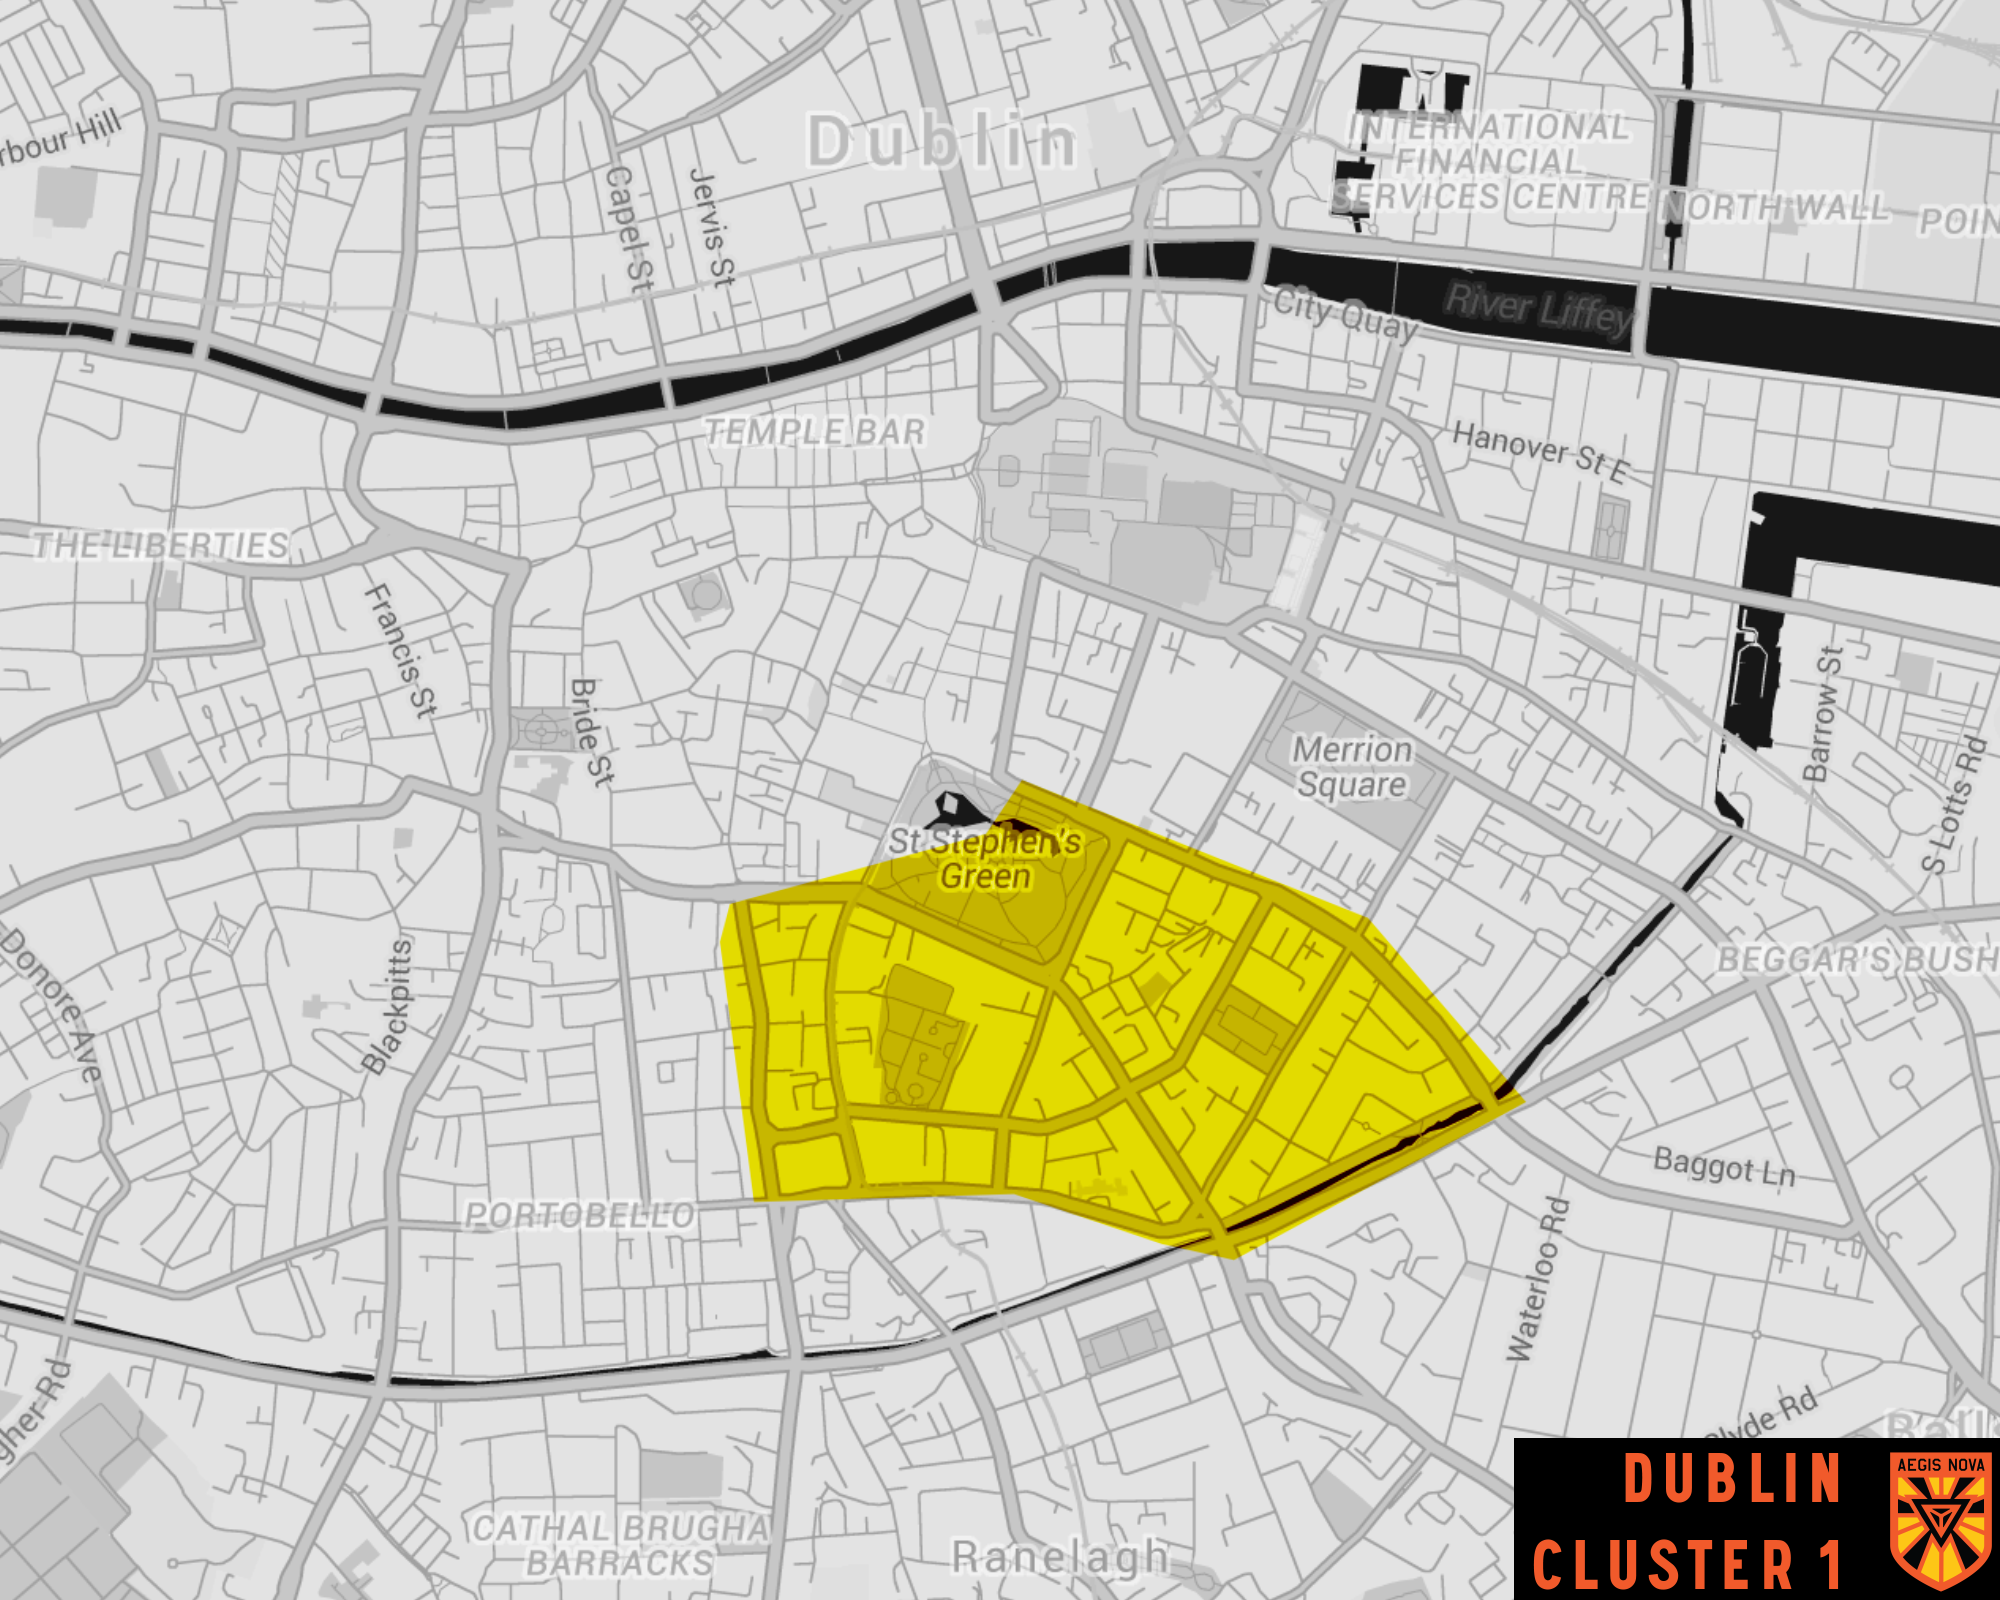 DublinCluster1.png